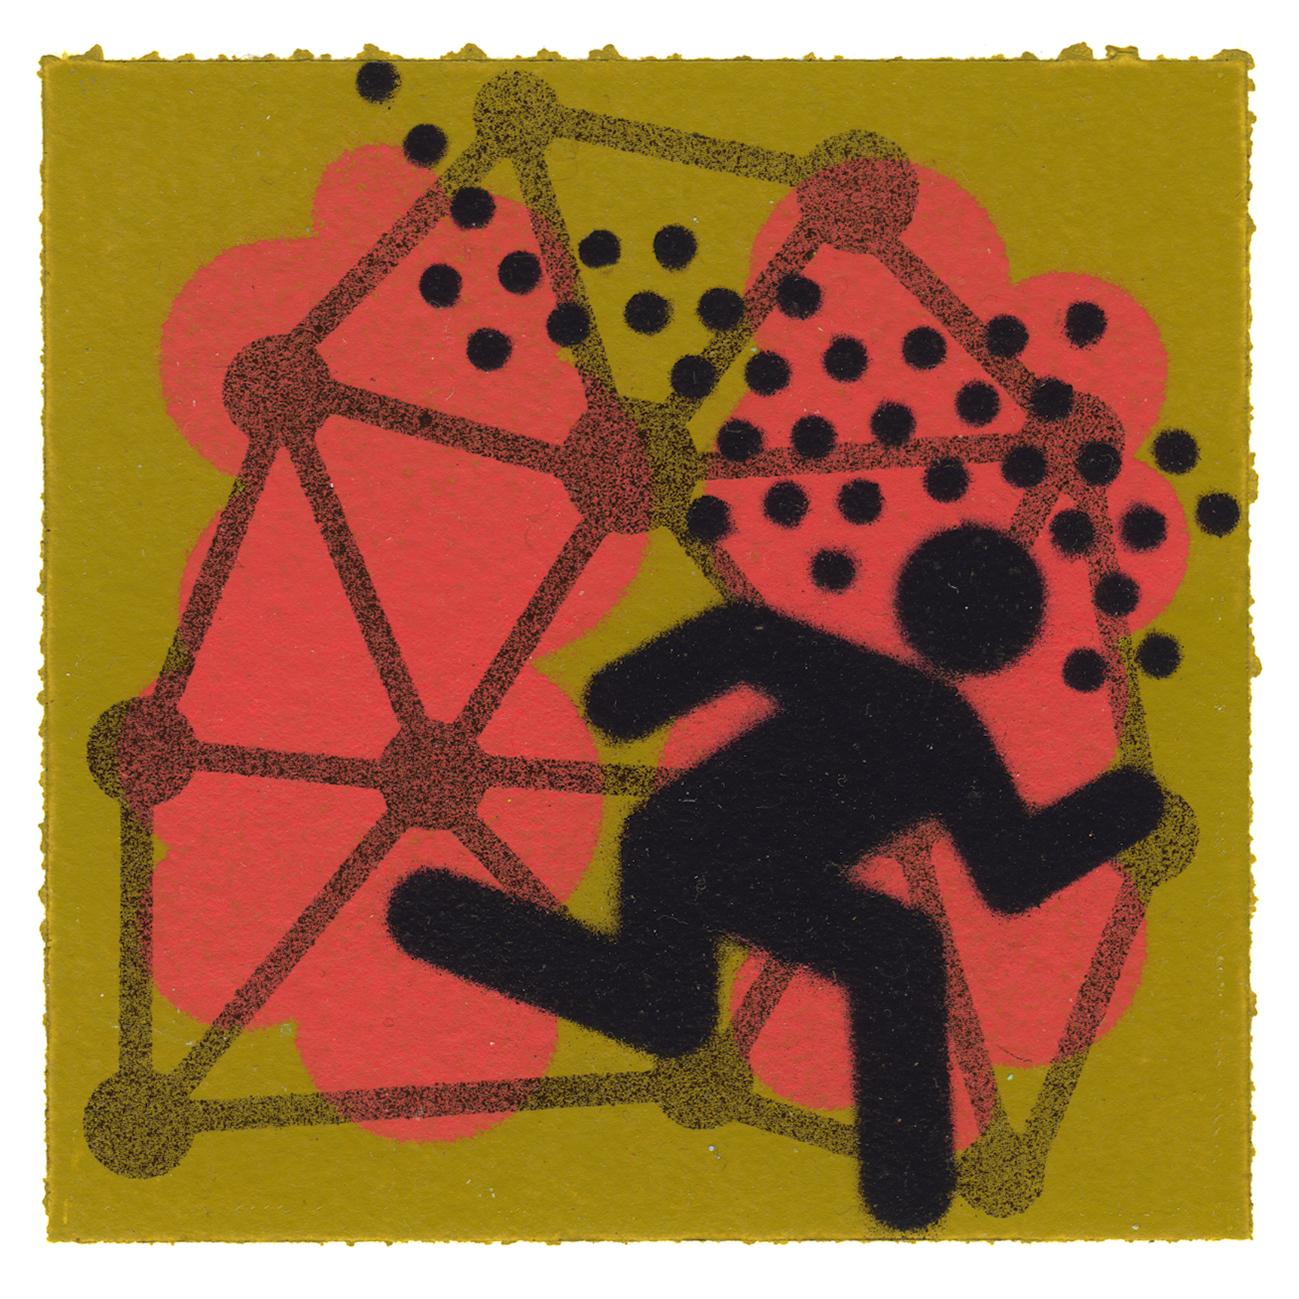 Untitled (Icons)